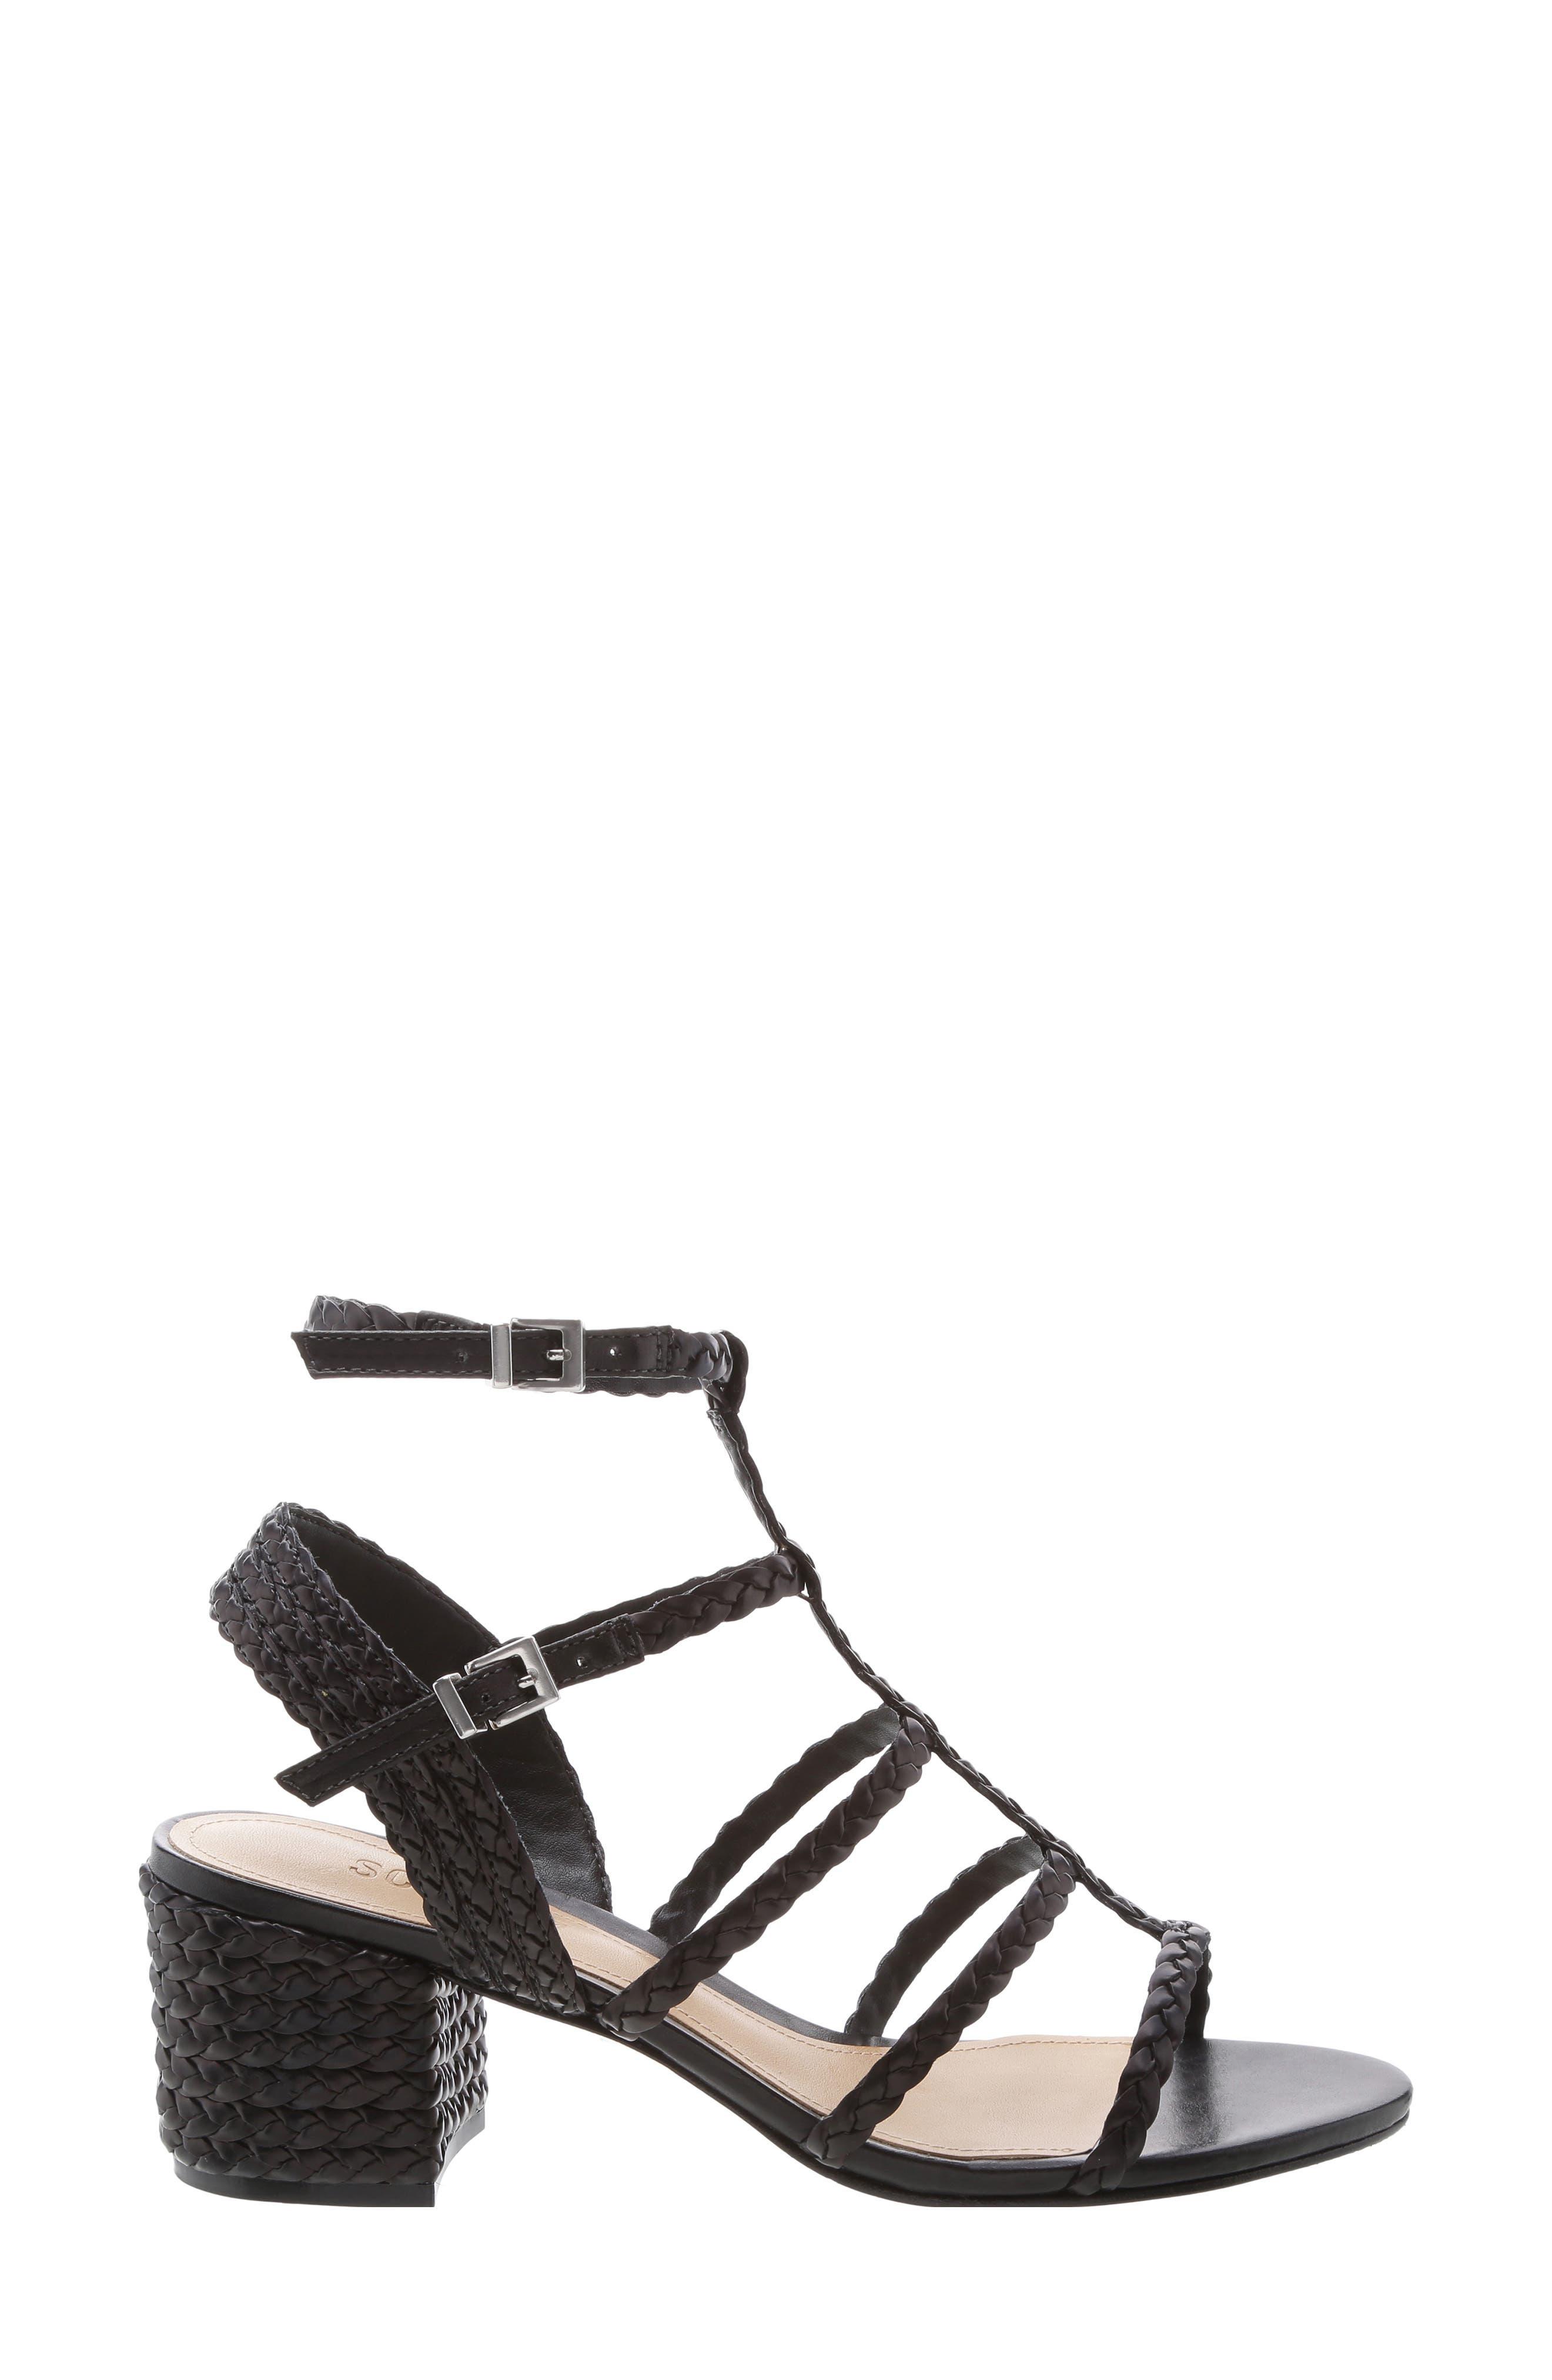 SCHUTZ, Rosalia Block Heel Sandal, Alternate thumbnail 3, color, BLACK LEATHER